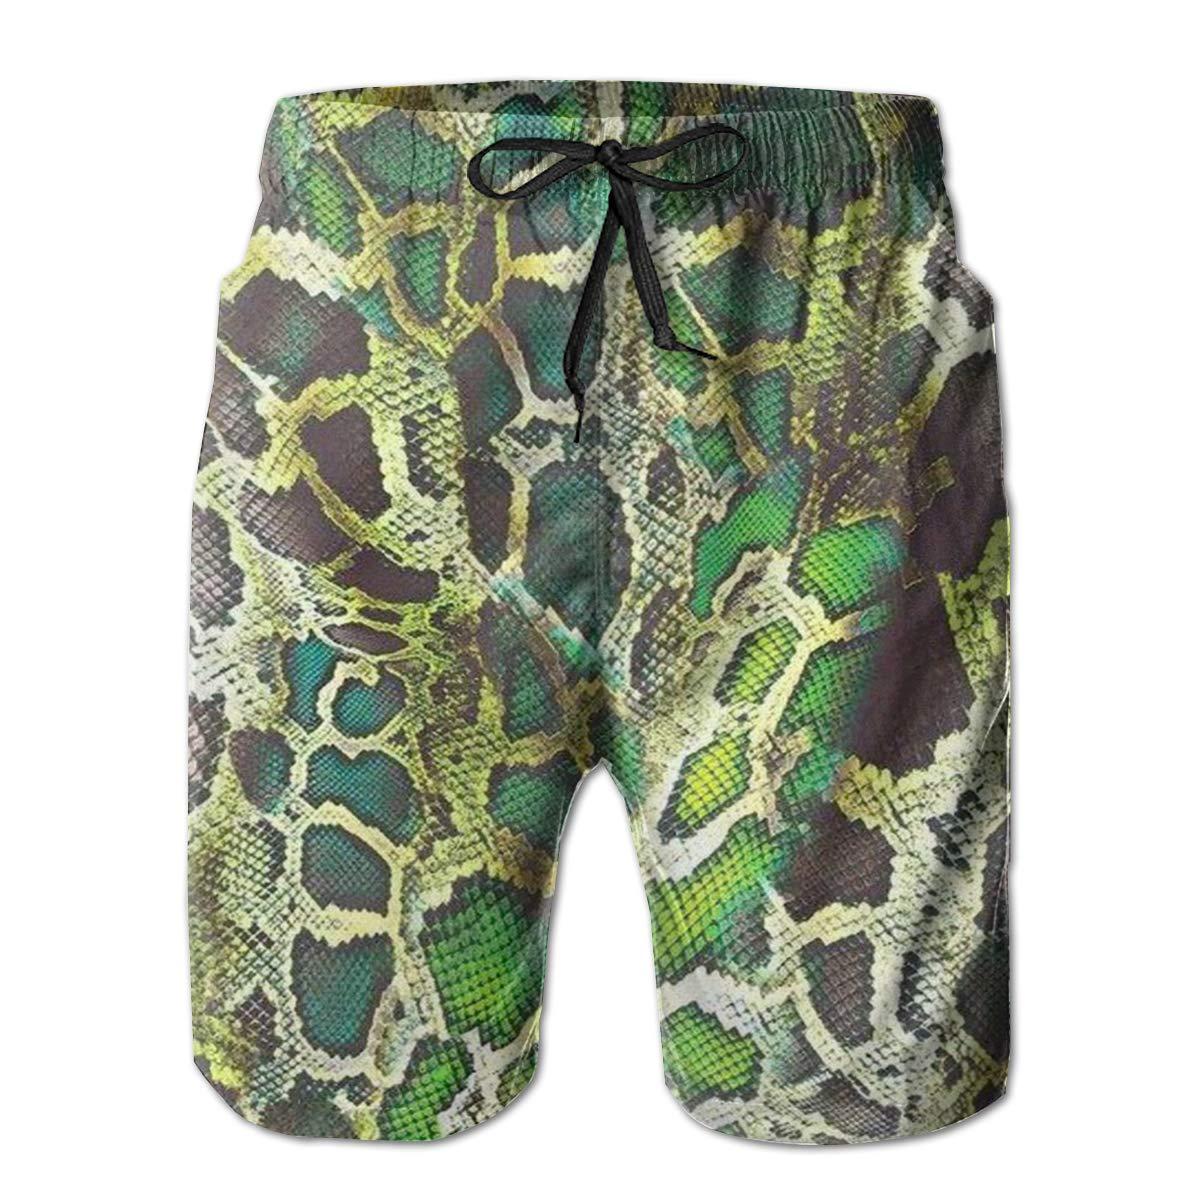 Emerald Boa Skin Mens Quick Dry Swim Trunks Beach Shorts with Mesh Lining